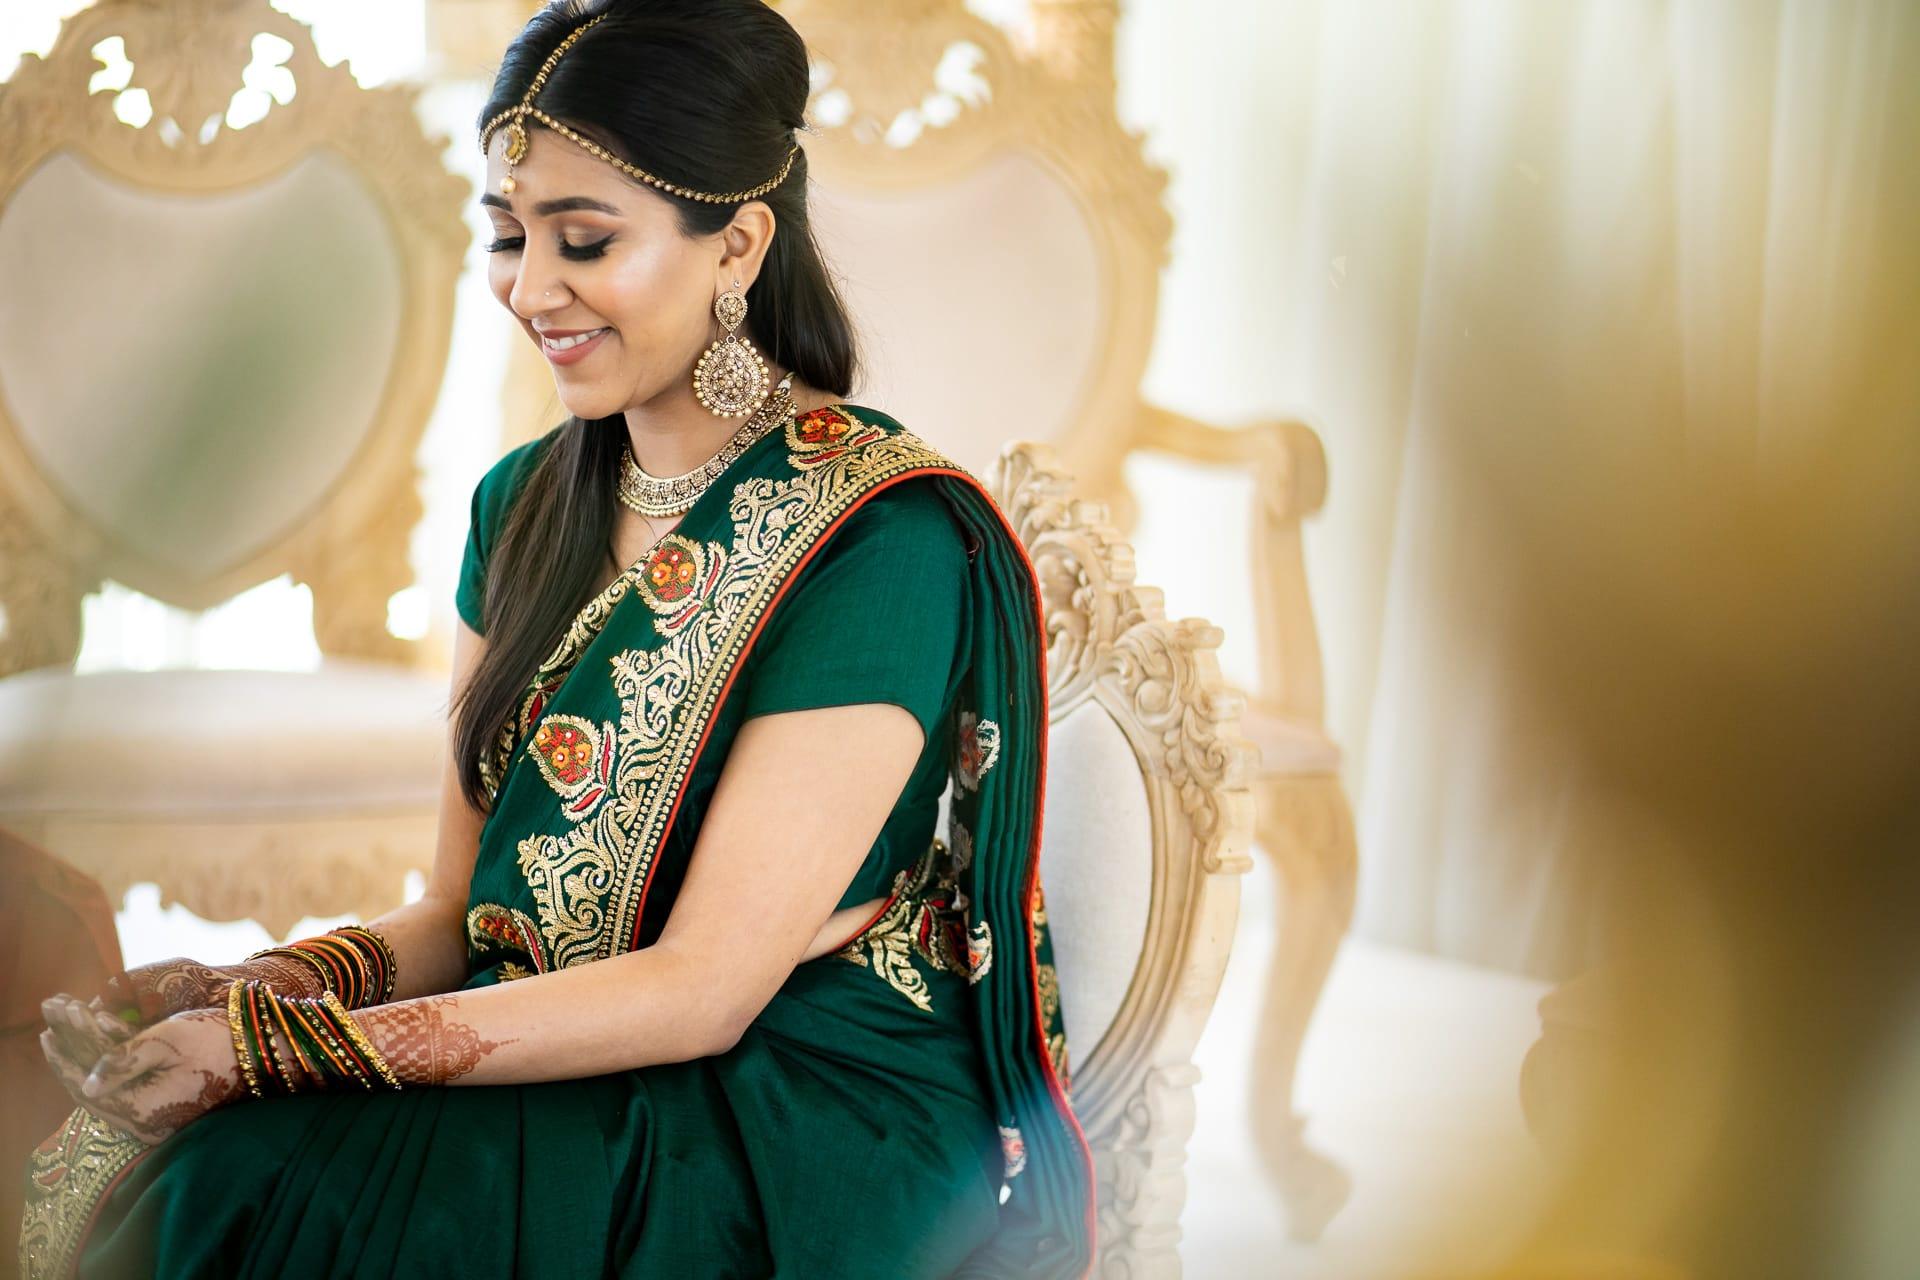 Indian Bride smiling